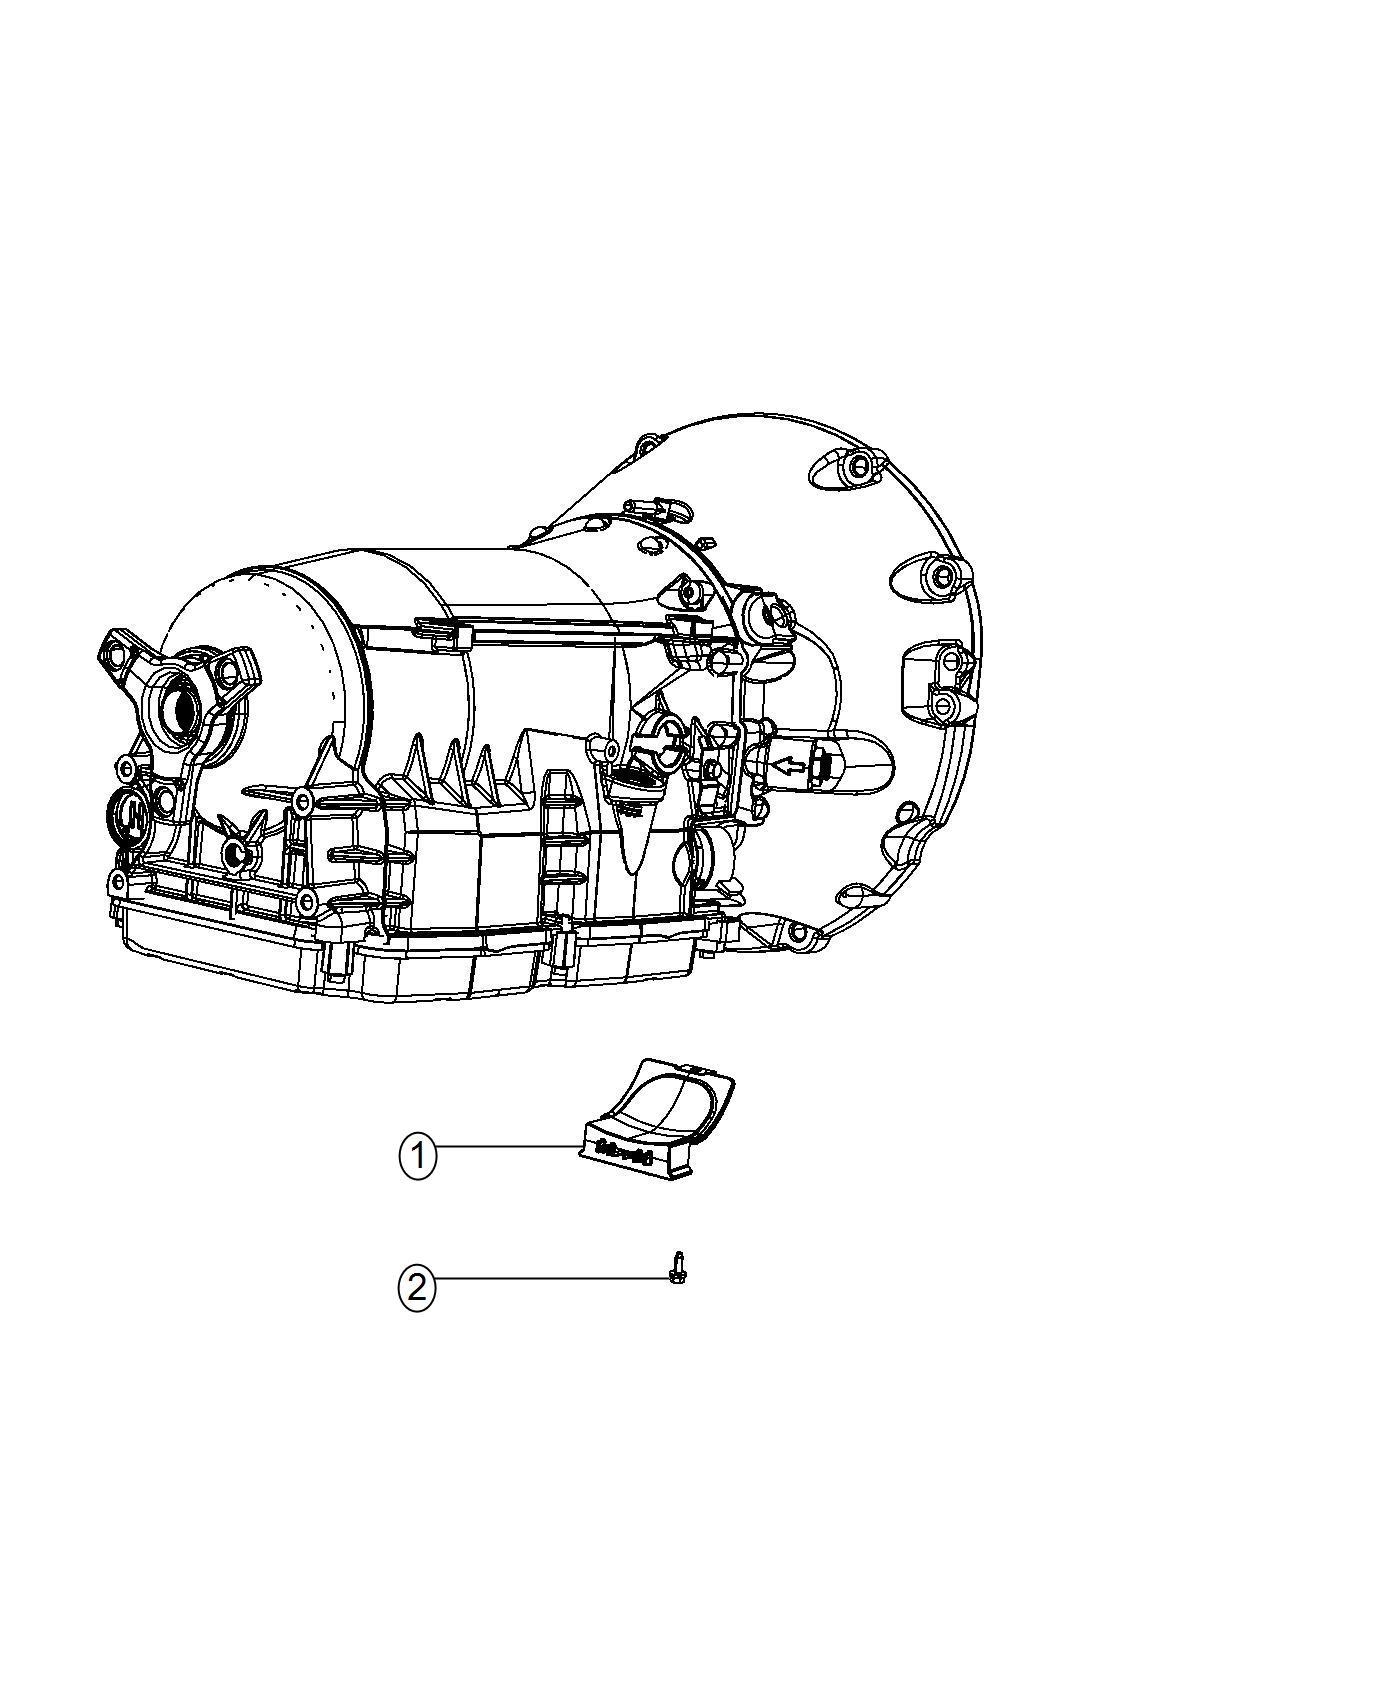 2013 Chrysler 300 Shield. Transmission. Mounting